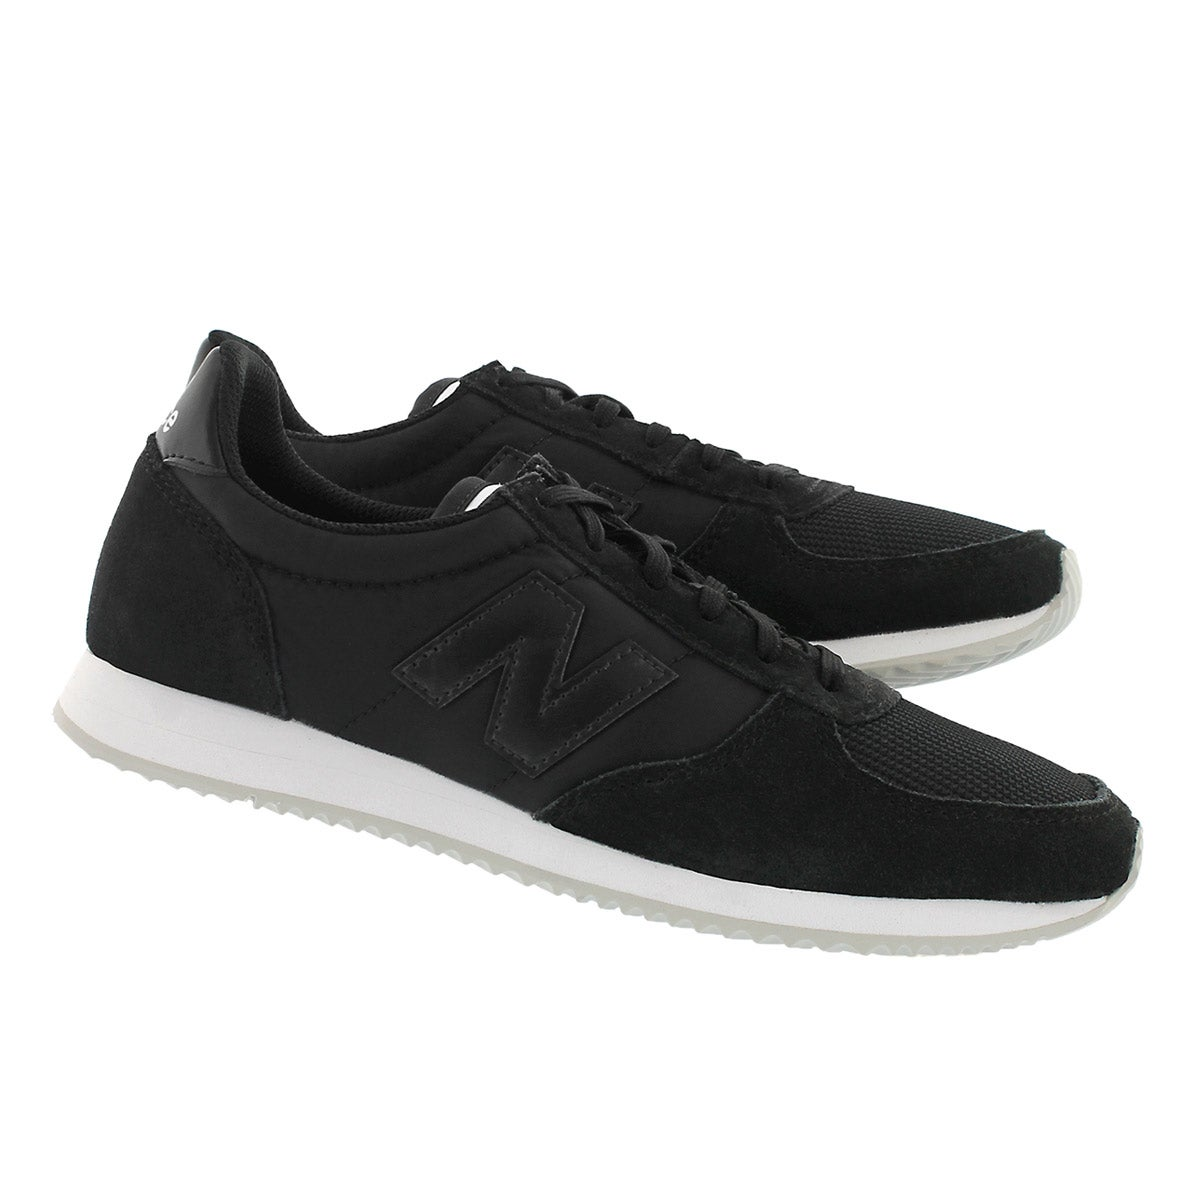 Lds 220 black lace up sneaker